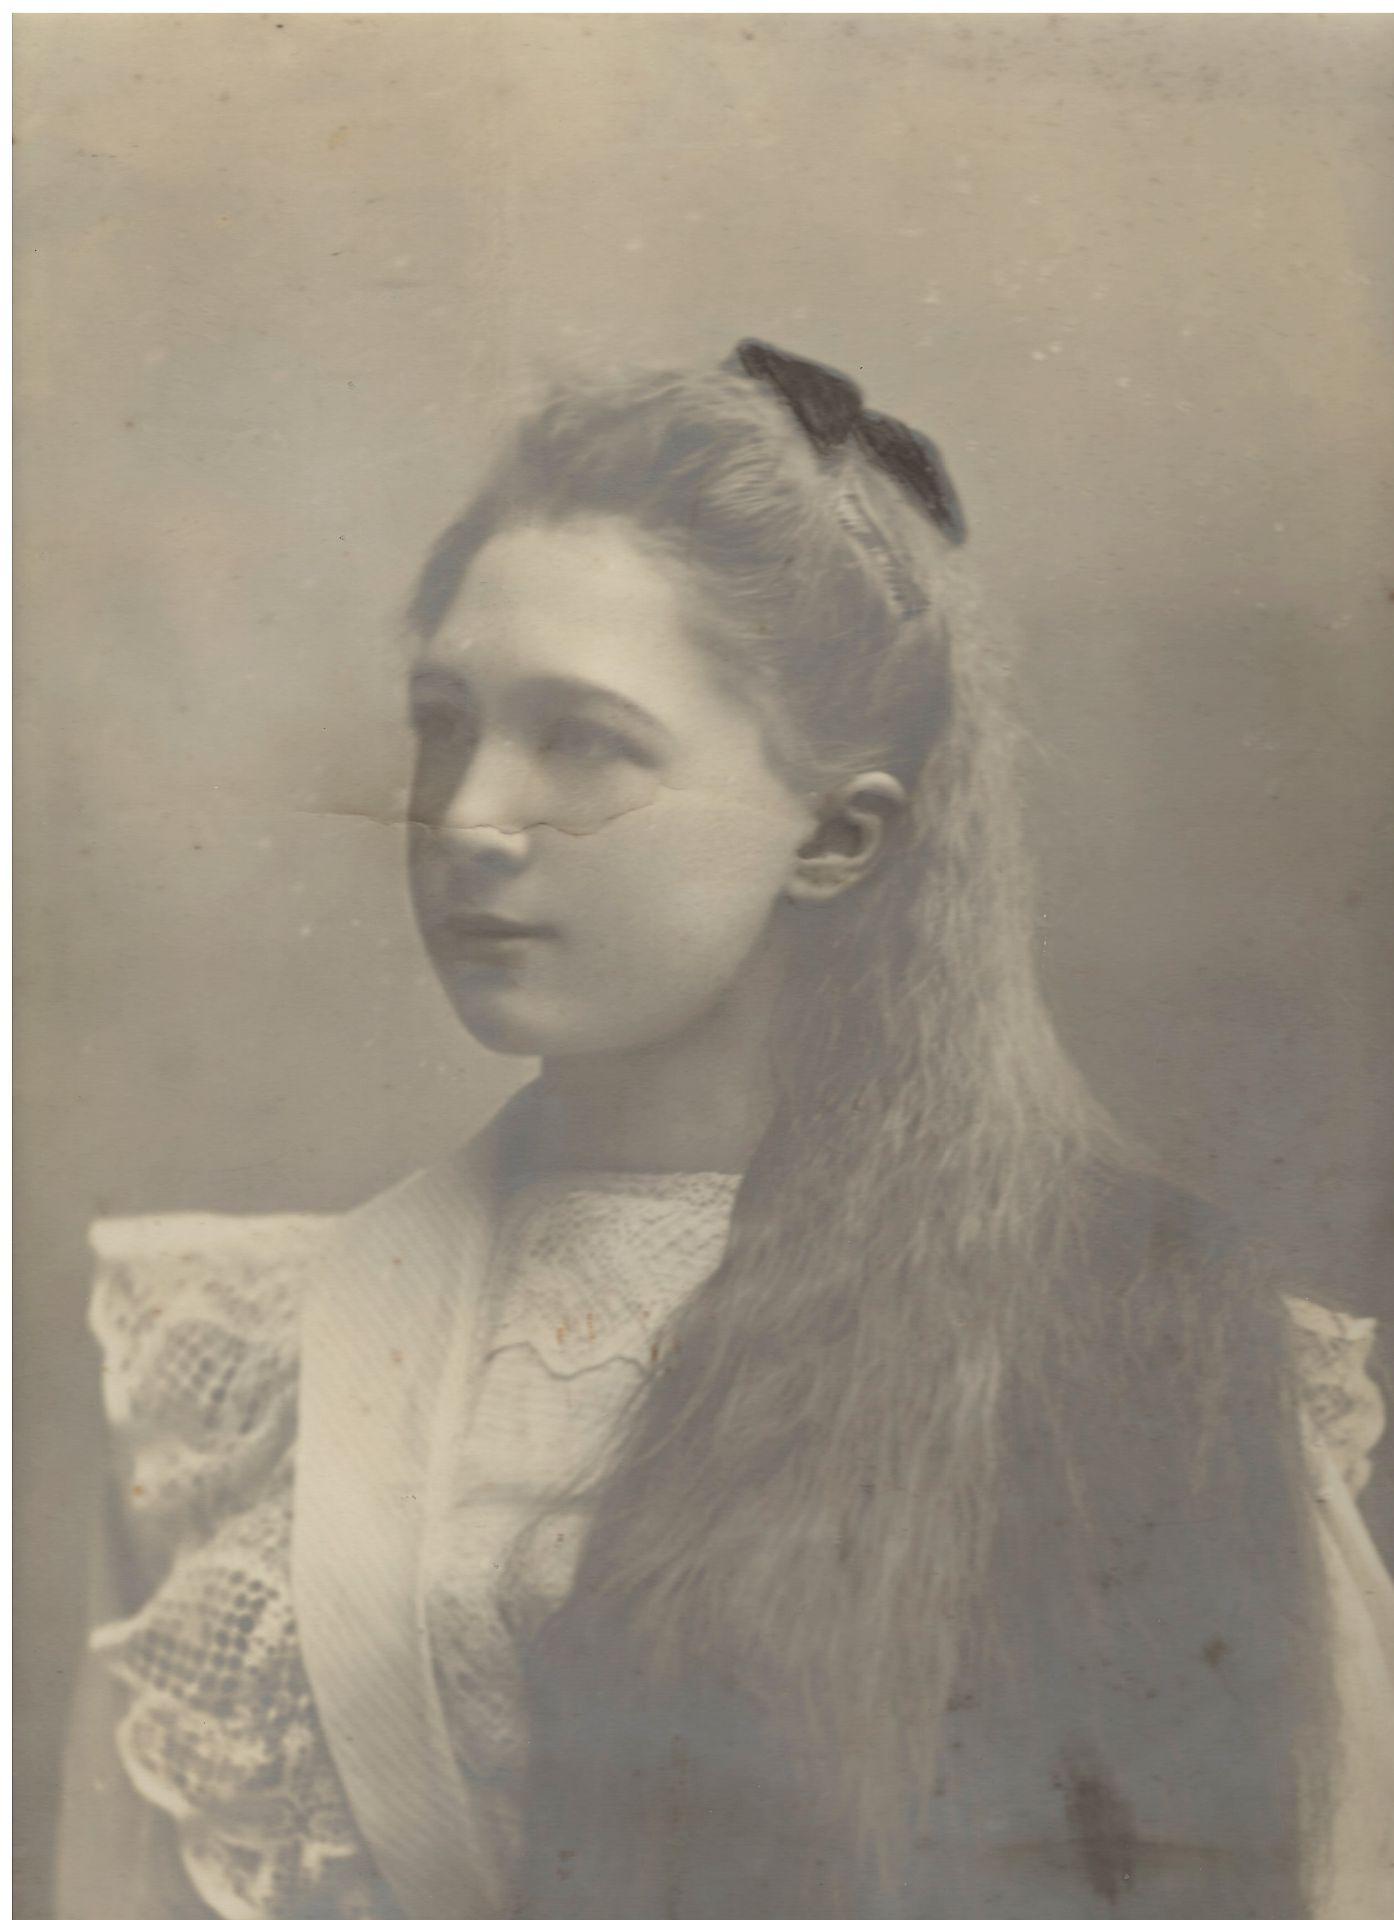 [Russian Empire]. Portrait of young opera singer V. Zakharieva. Photograph. Original print. [Late 19